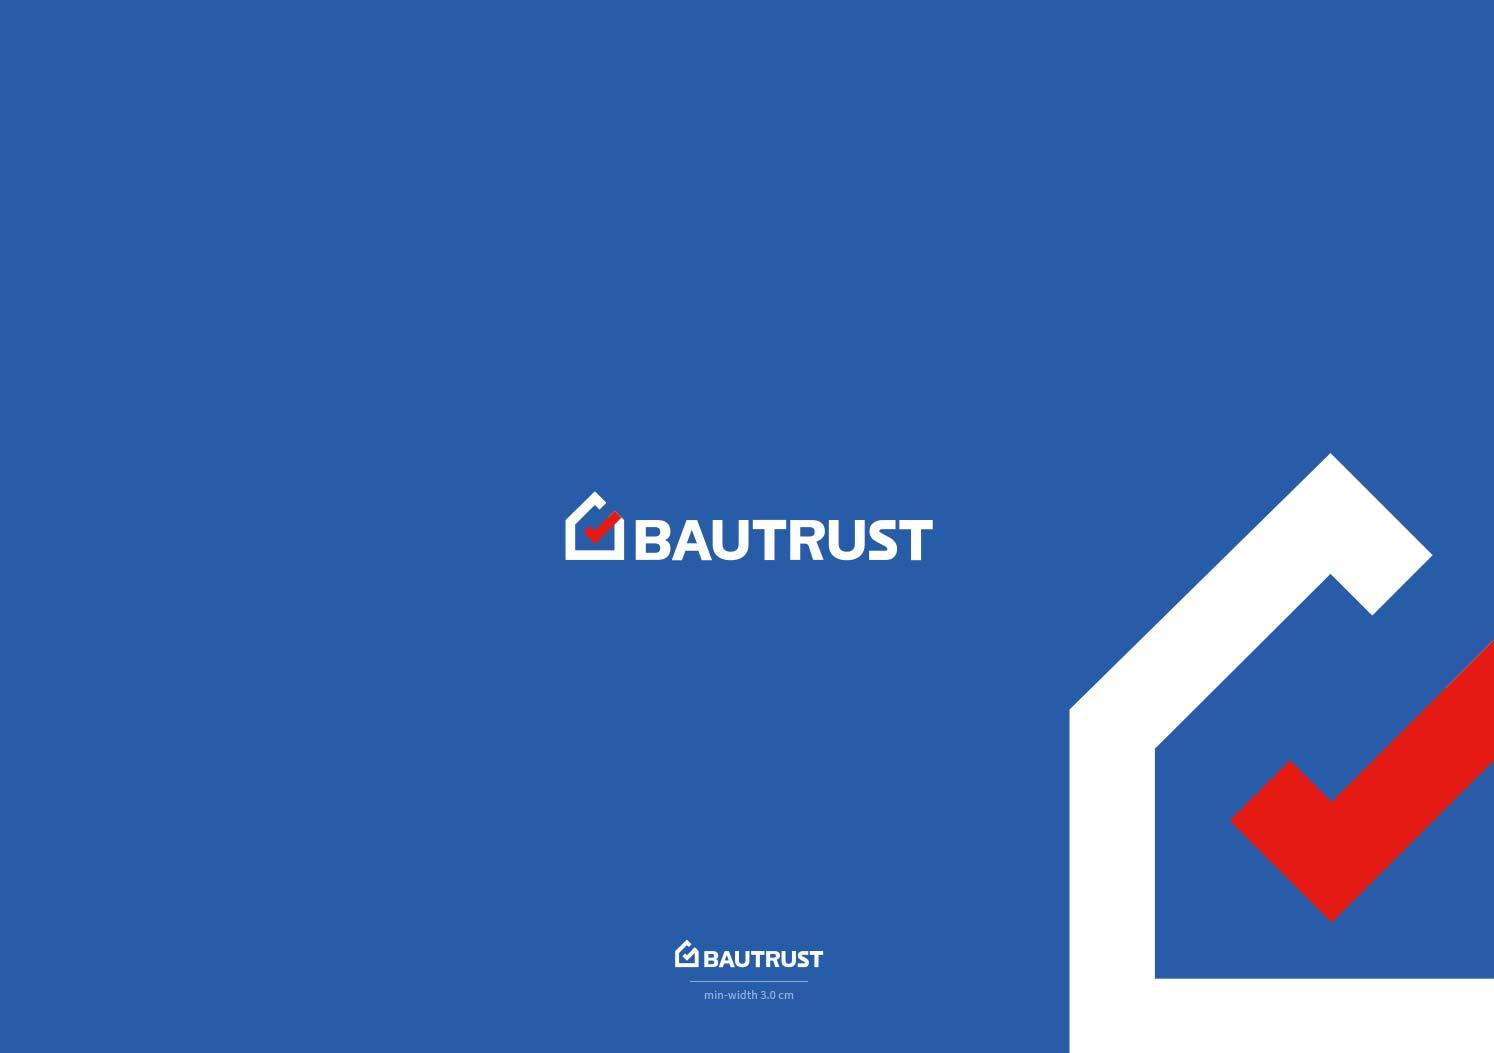 Design logo brand identity negative version blue